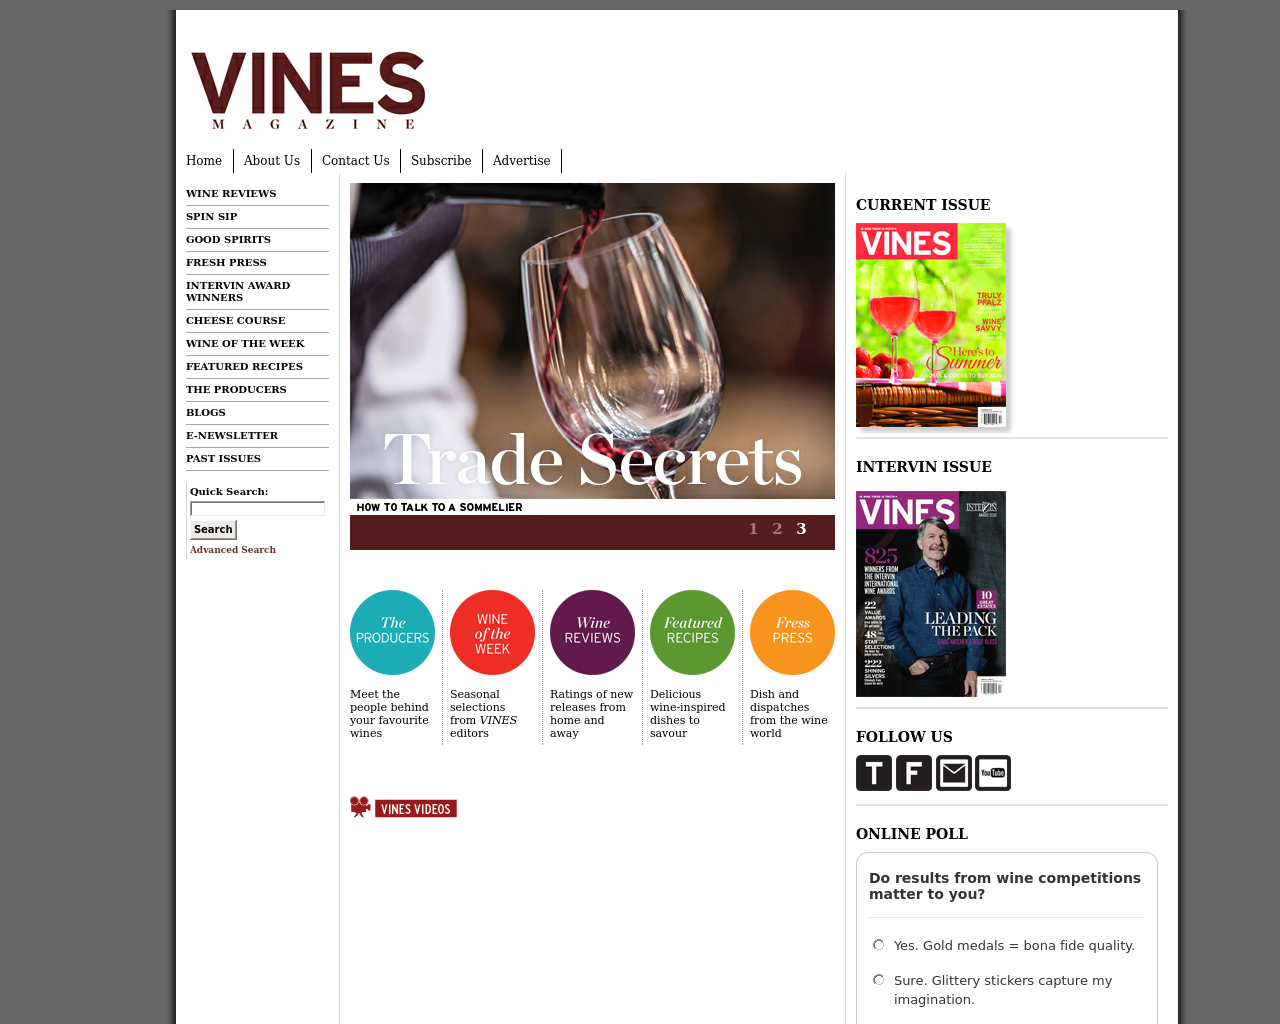 Vines-Magazine-Advertising-Reviews-Pricing